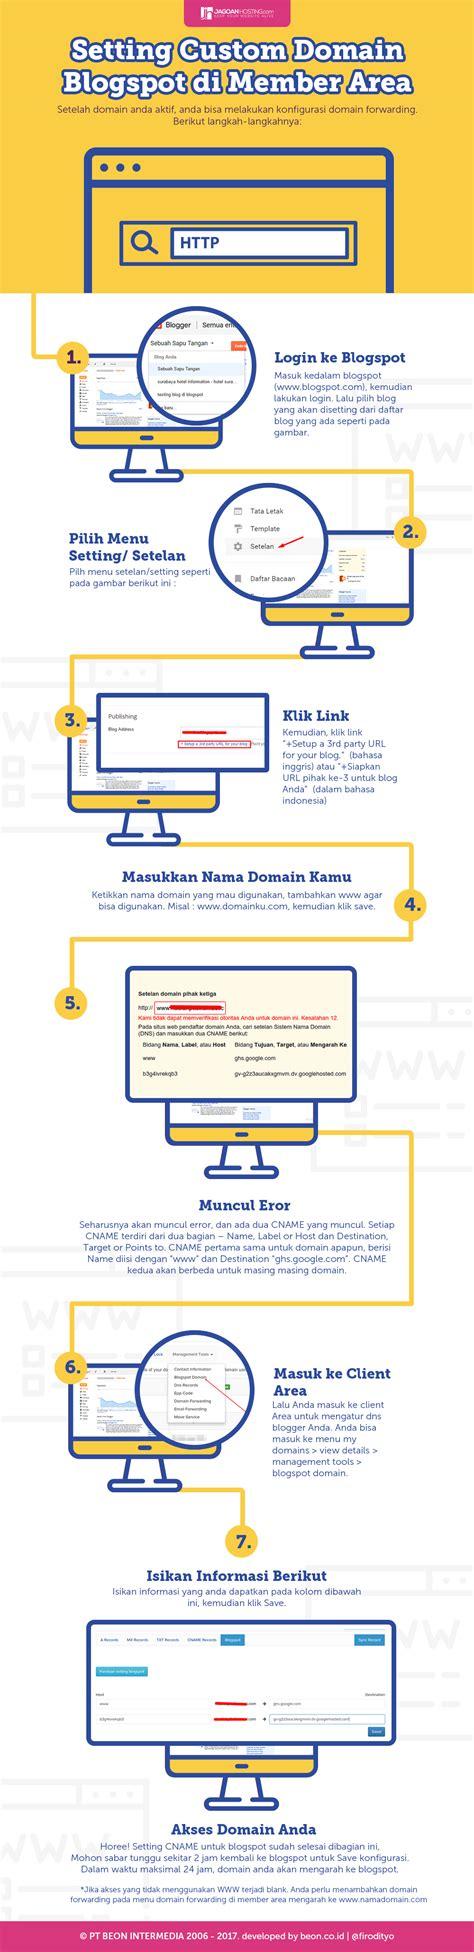 cara membuat blog agar menarik cara membuat konten marketing yang menarik agar dagangan